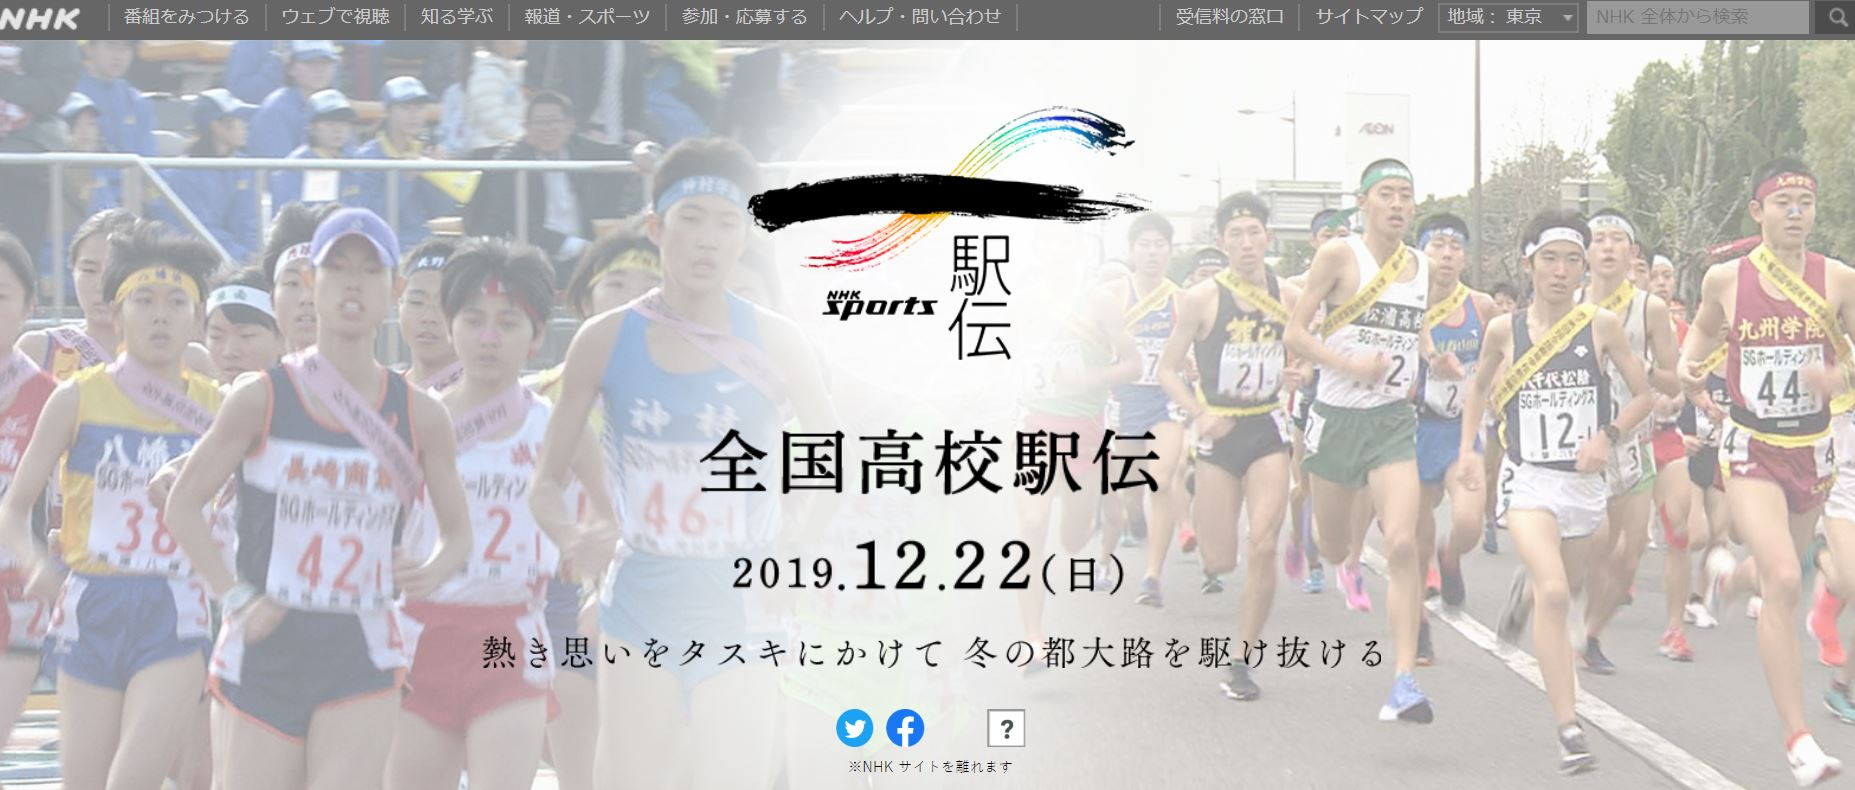 NHK公式サイト(全国高校駅伝)